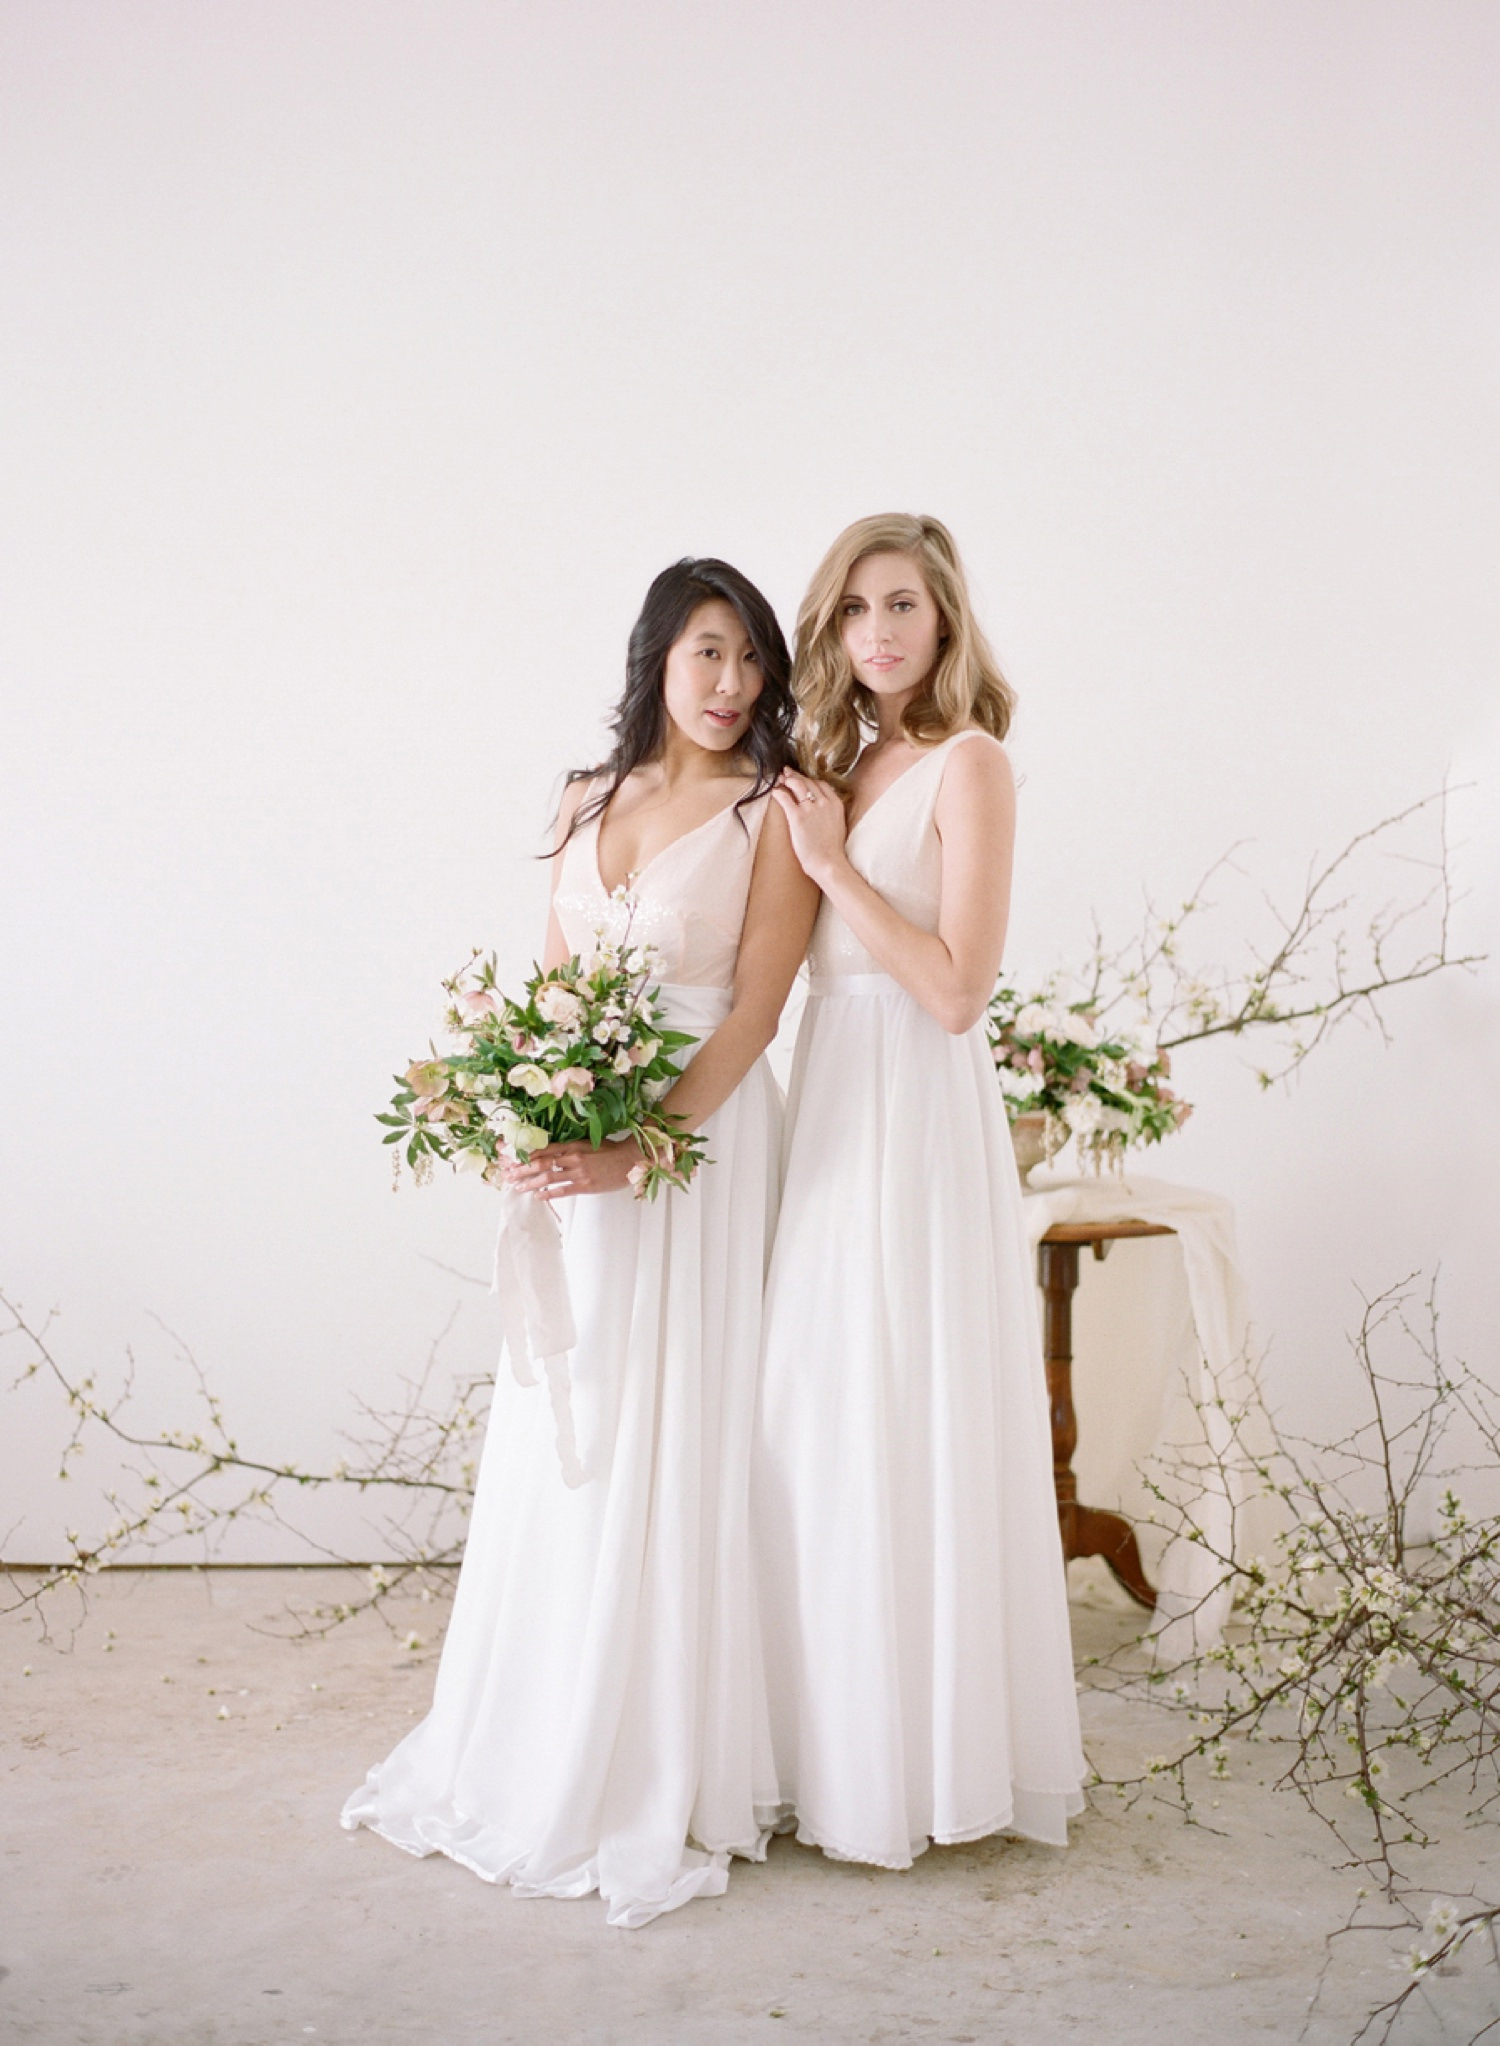 bridal lookbook photographer washington dc